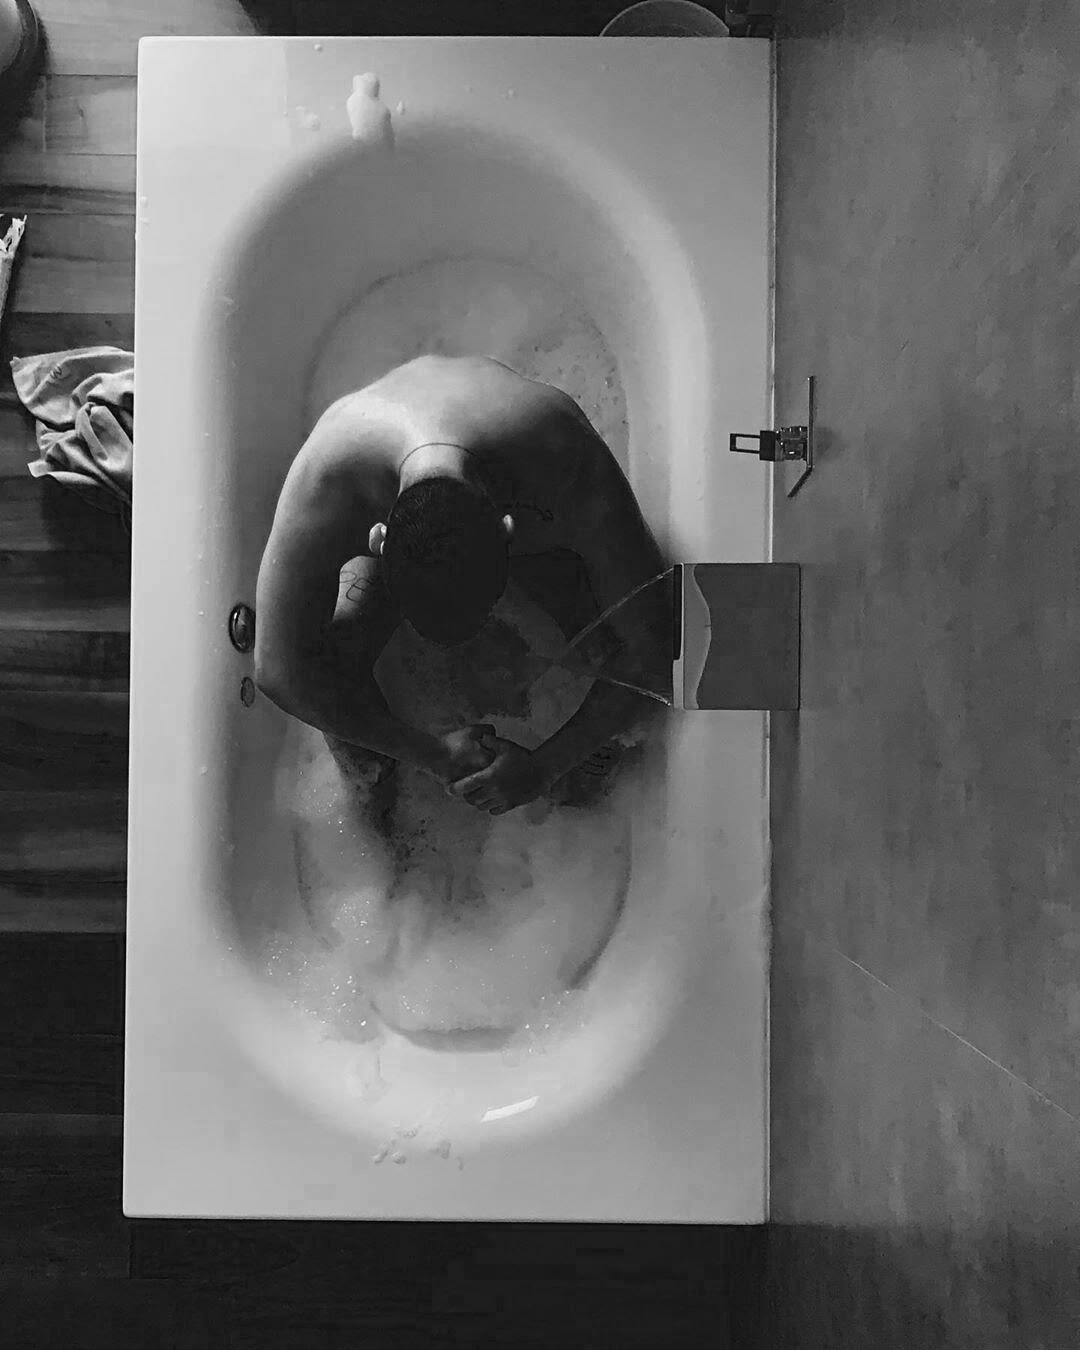 BathTubE, by VF.